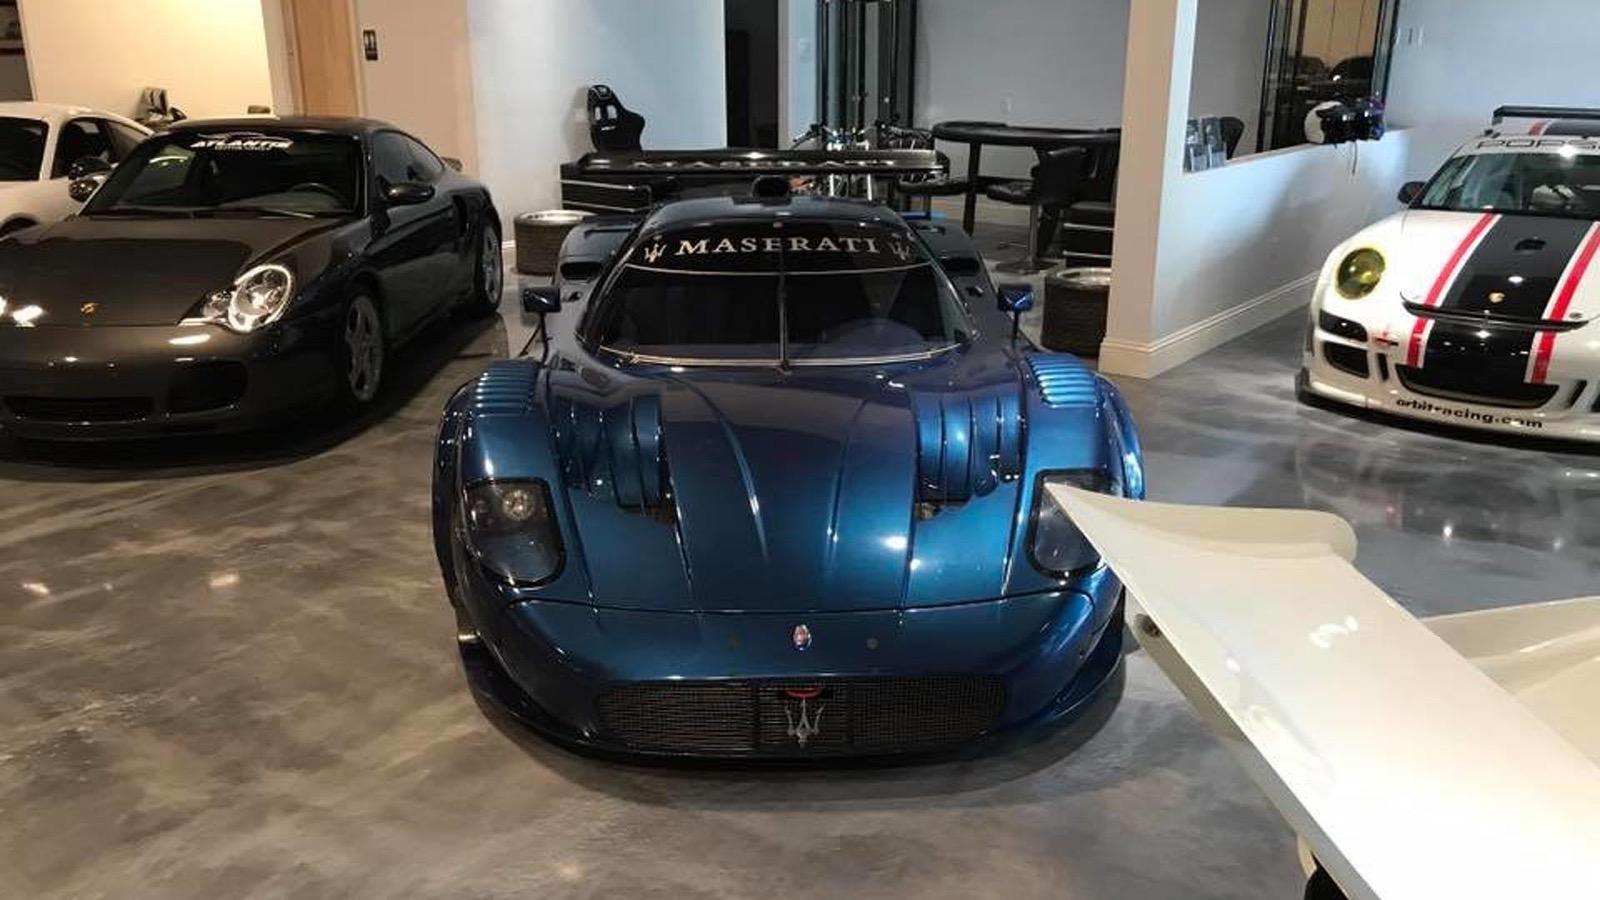 2006_Maserati_MC12_Corsa_25